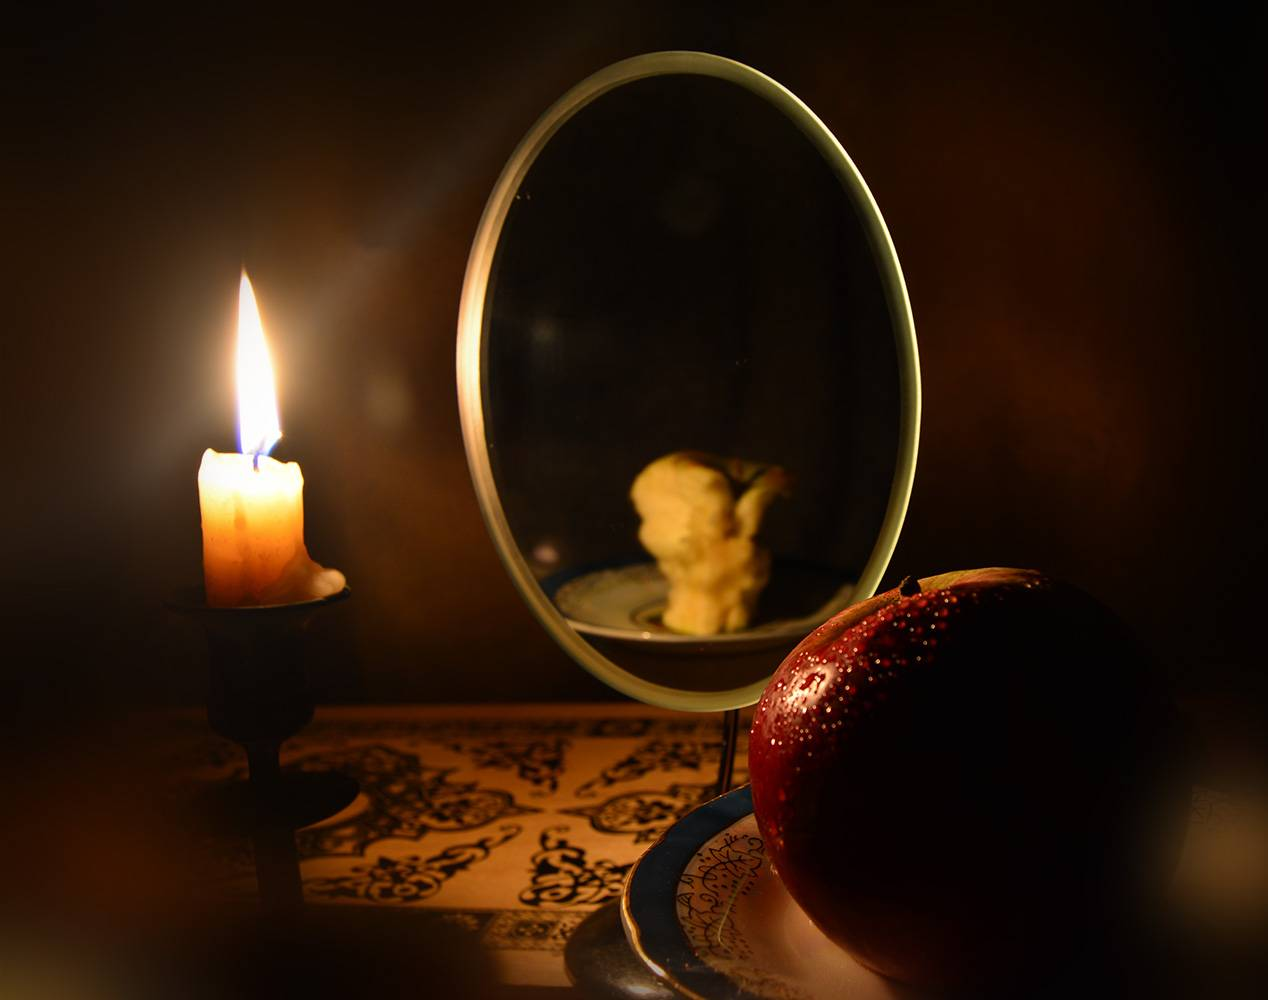 Гадание на зеркало и свечи: на будущее, на суженого